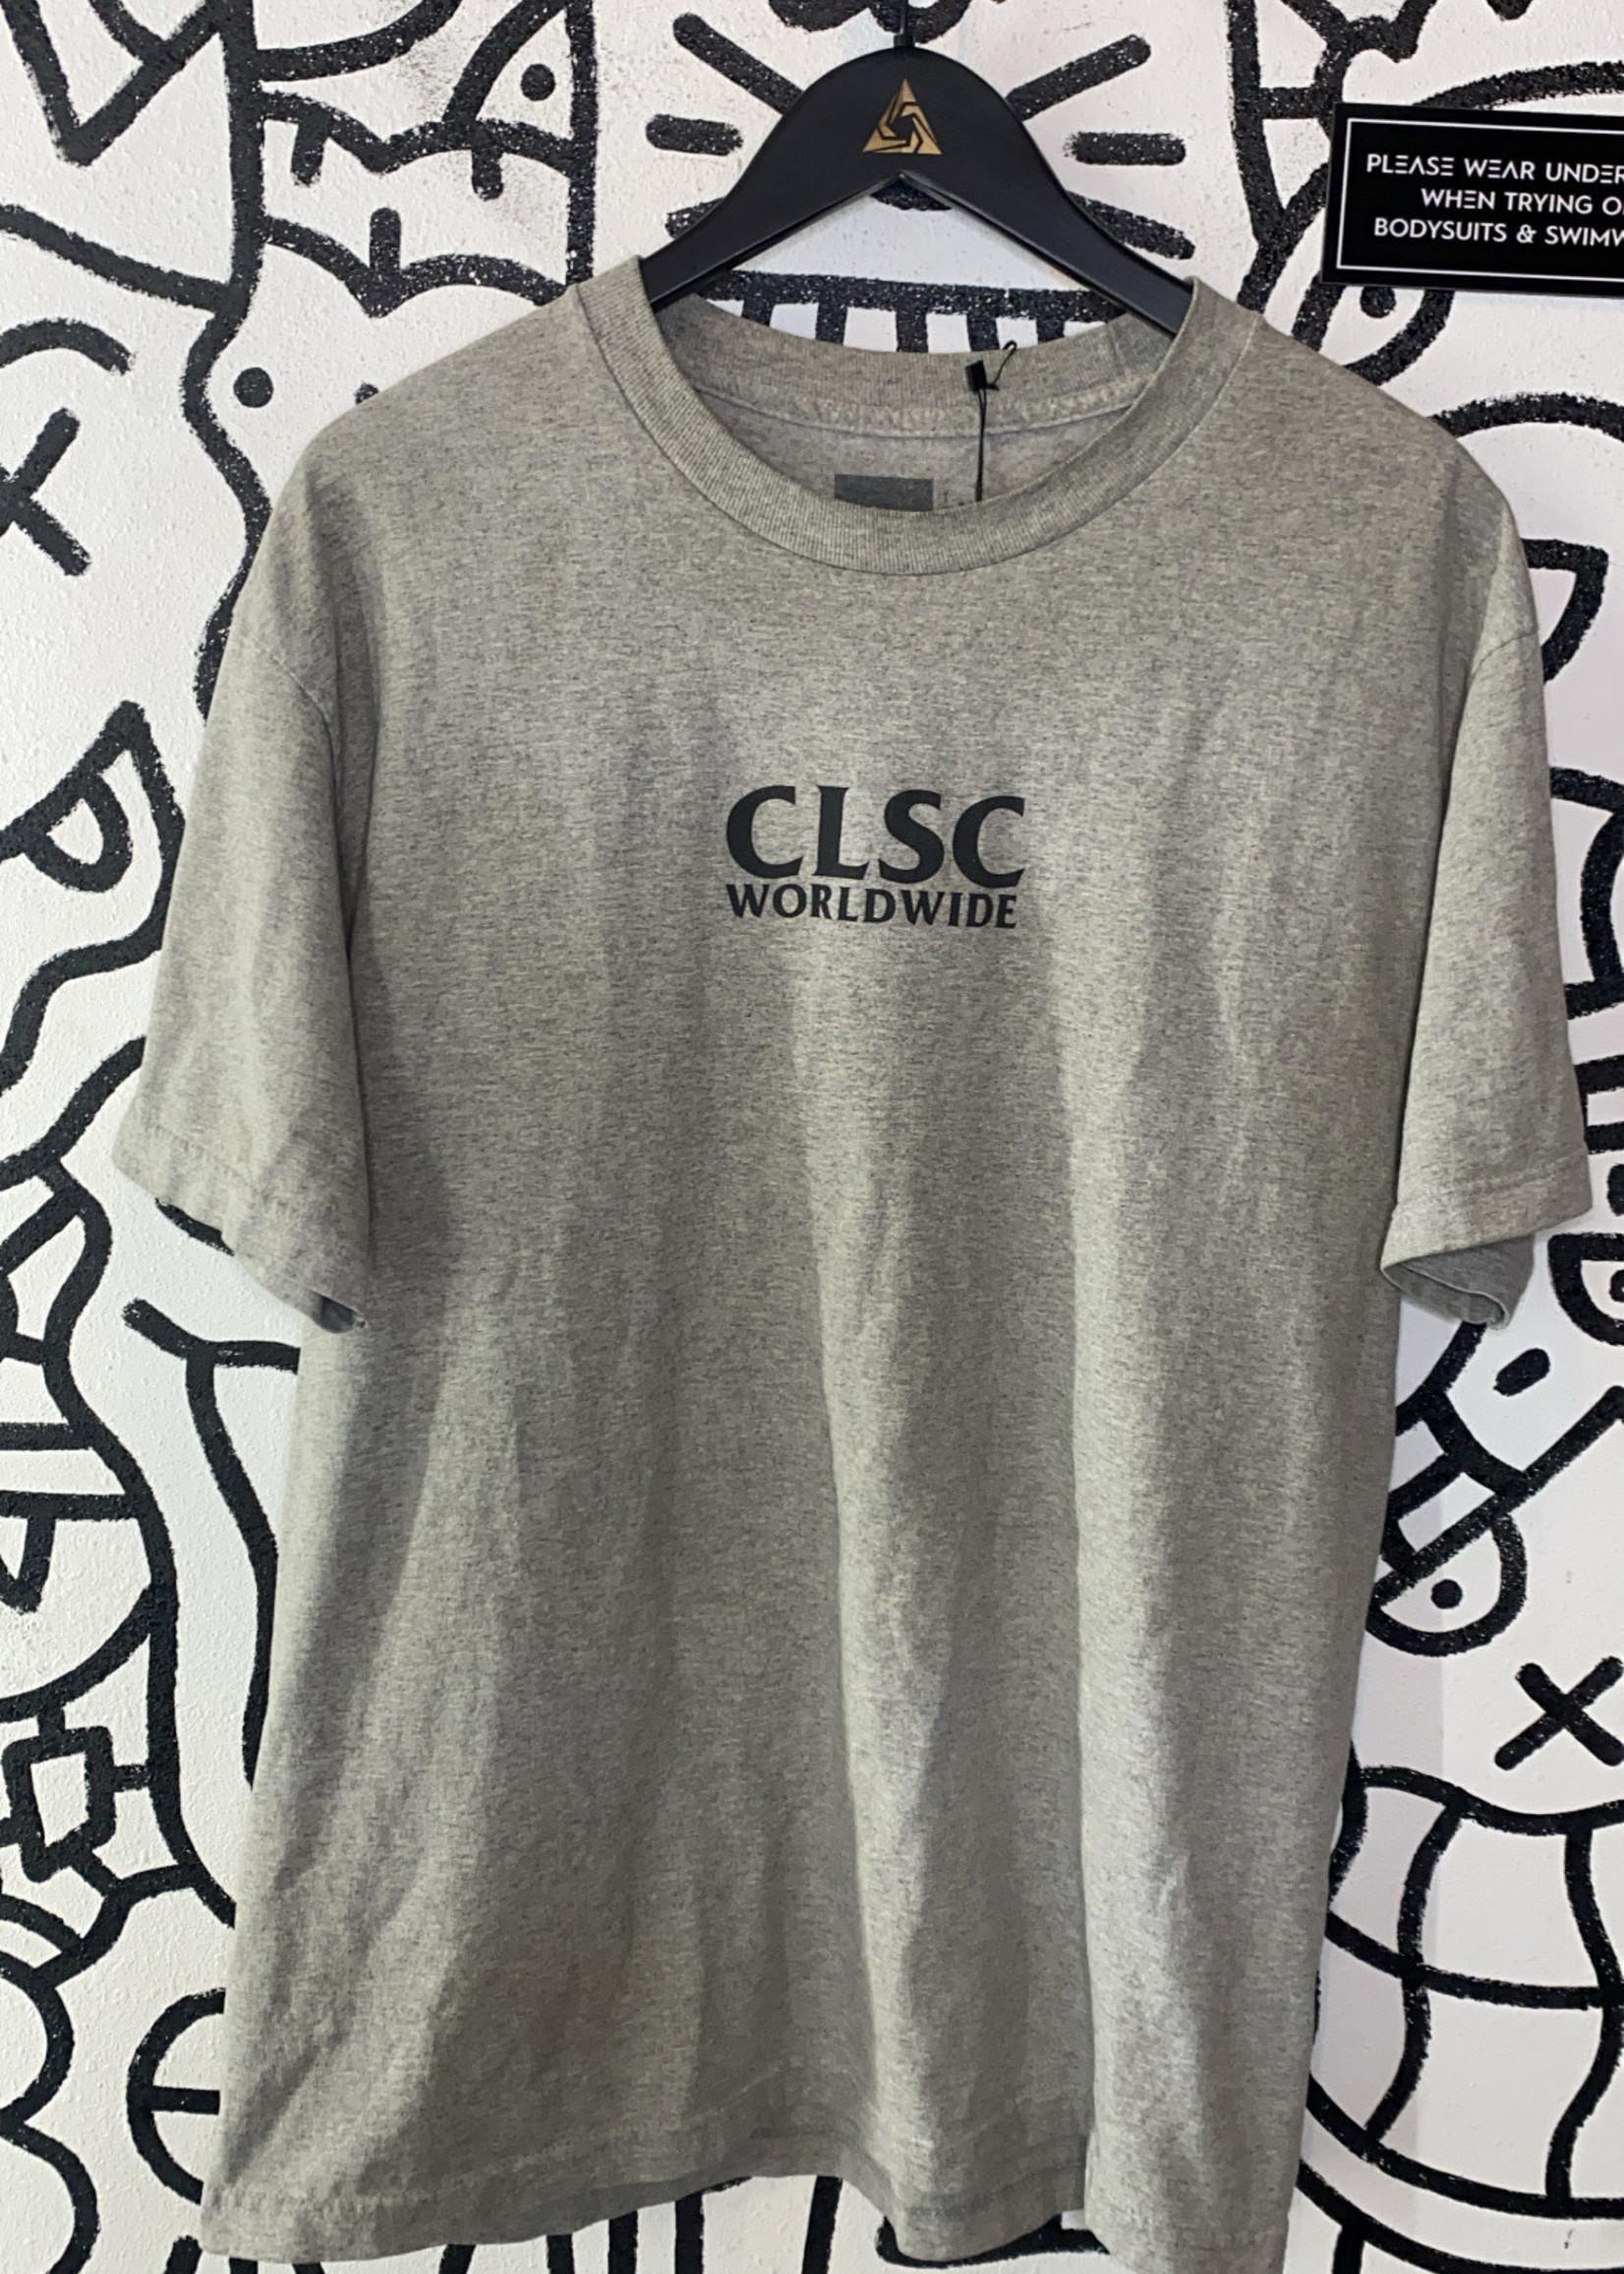 CLSC Worldwide Grey Tee L